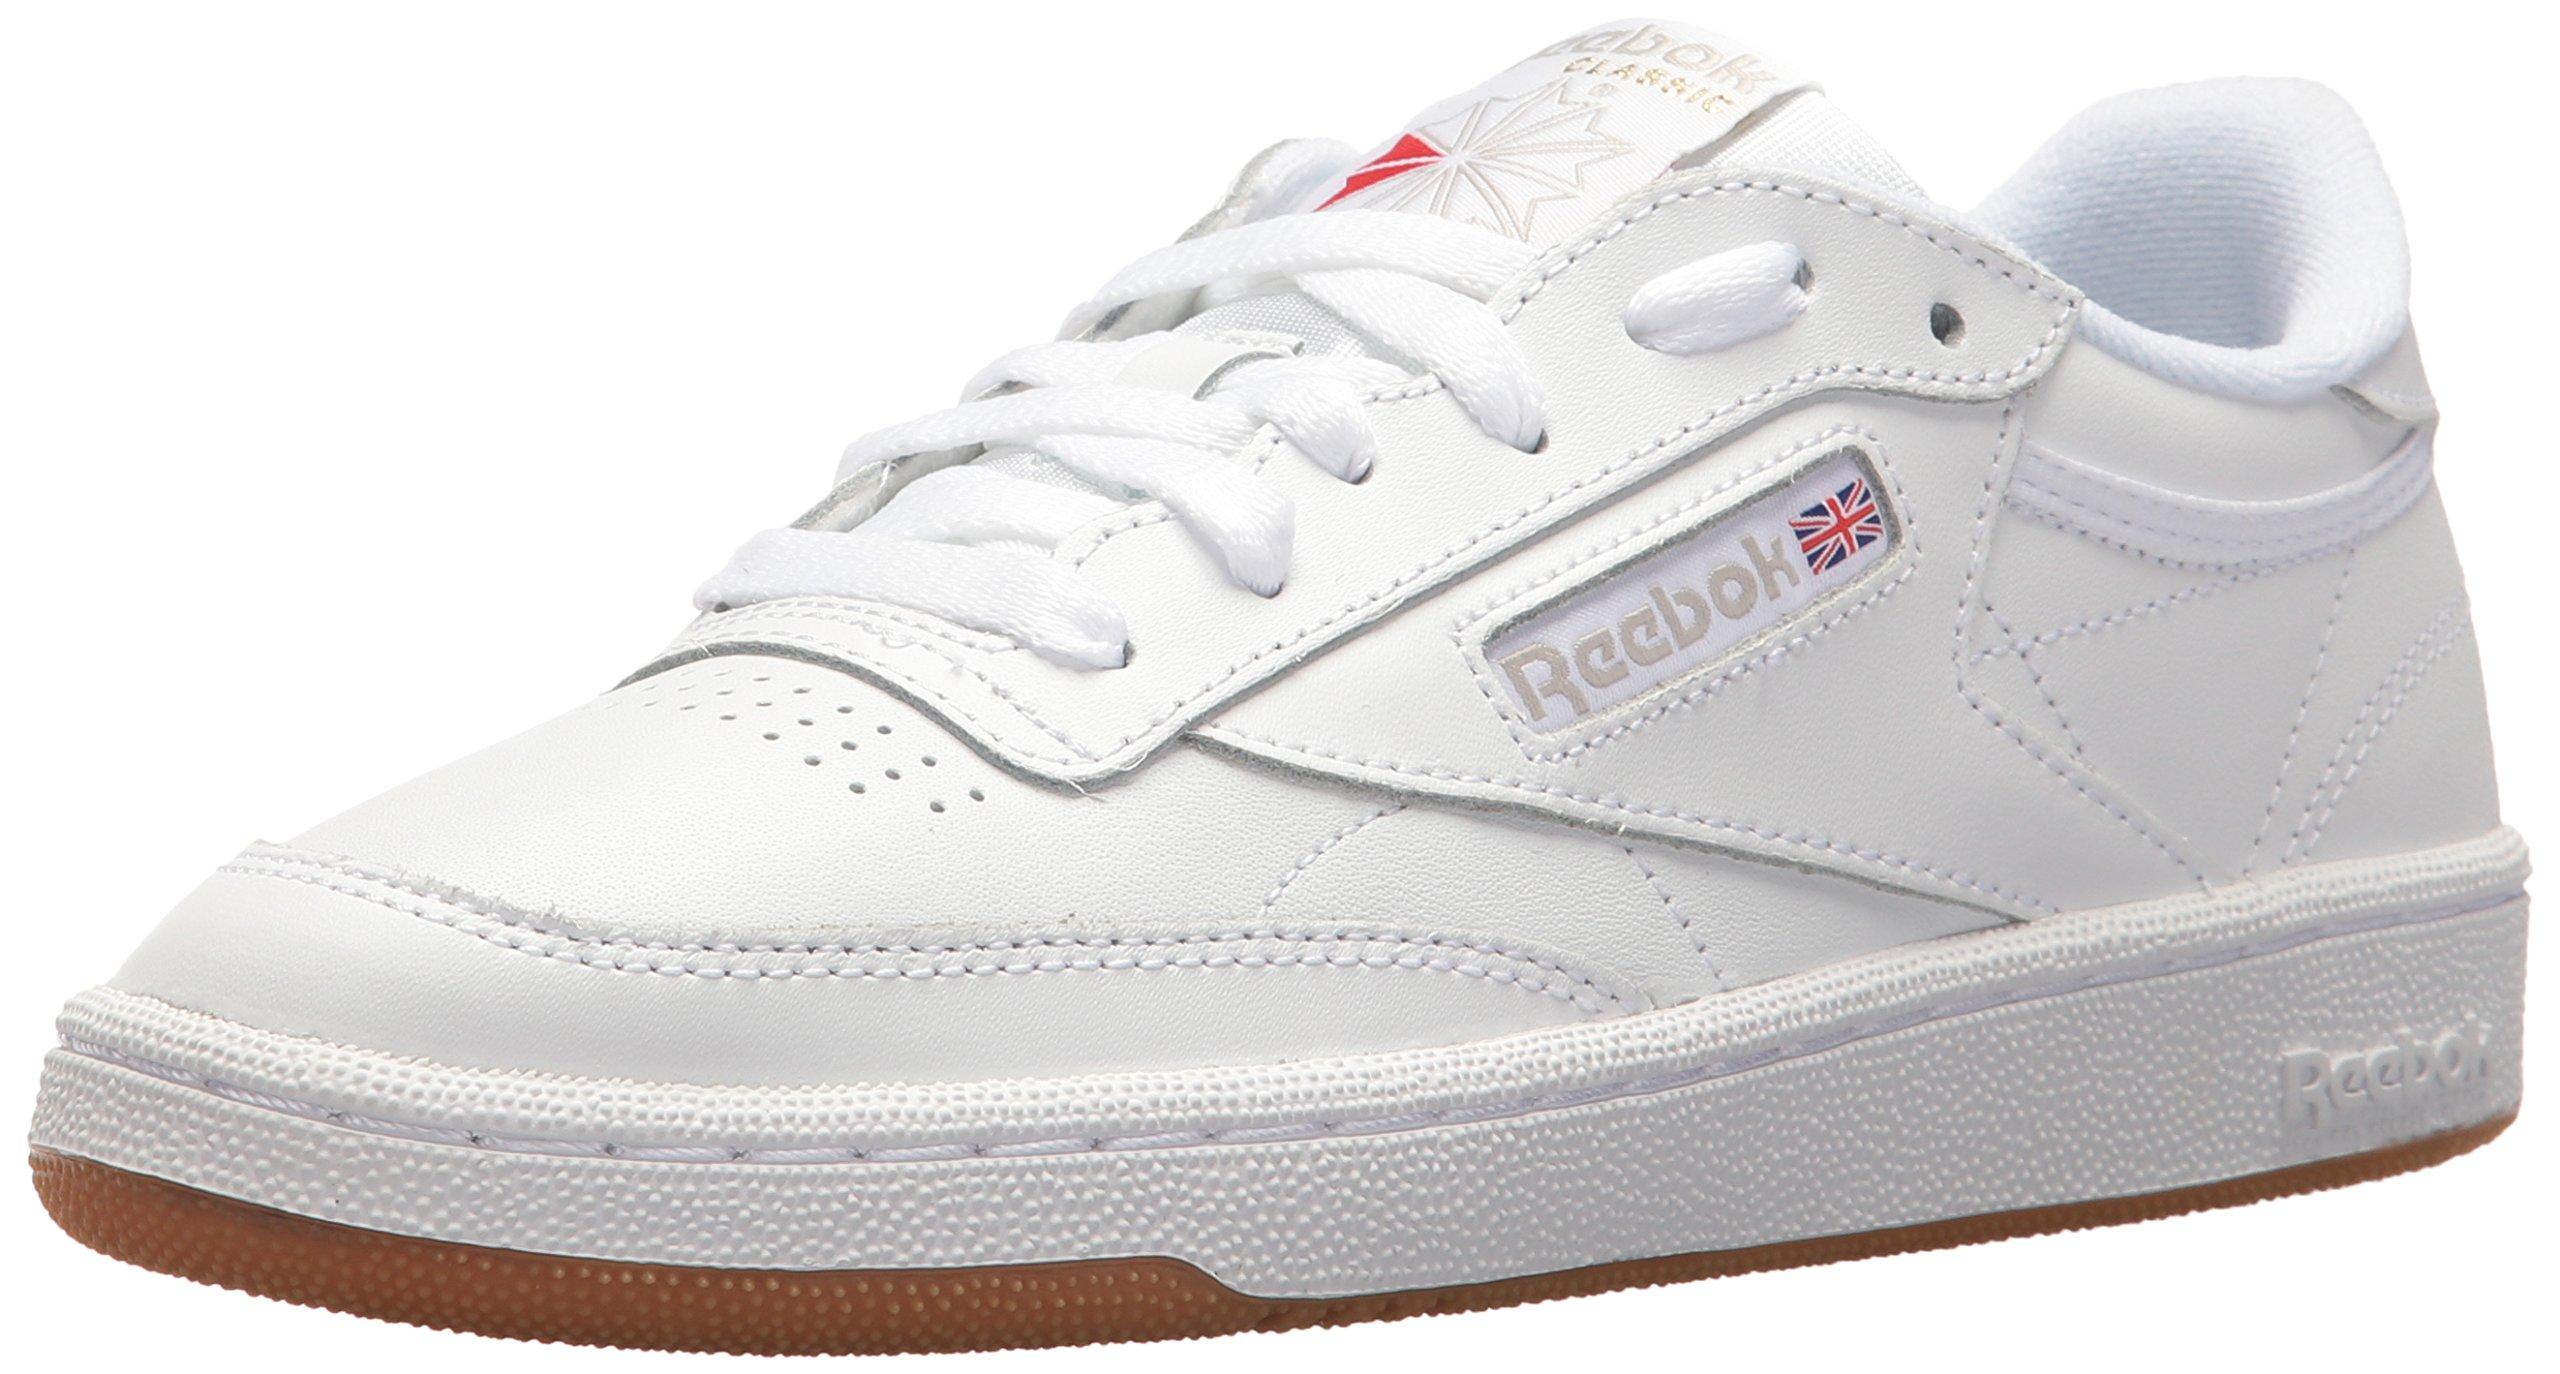 Reebok Women's Club C 85 Running Shoe, White/Light Grey/Gum, 7.5 M US